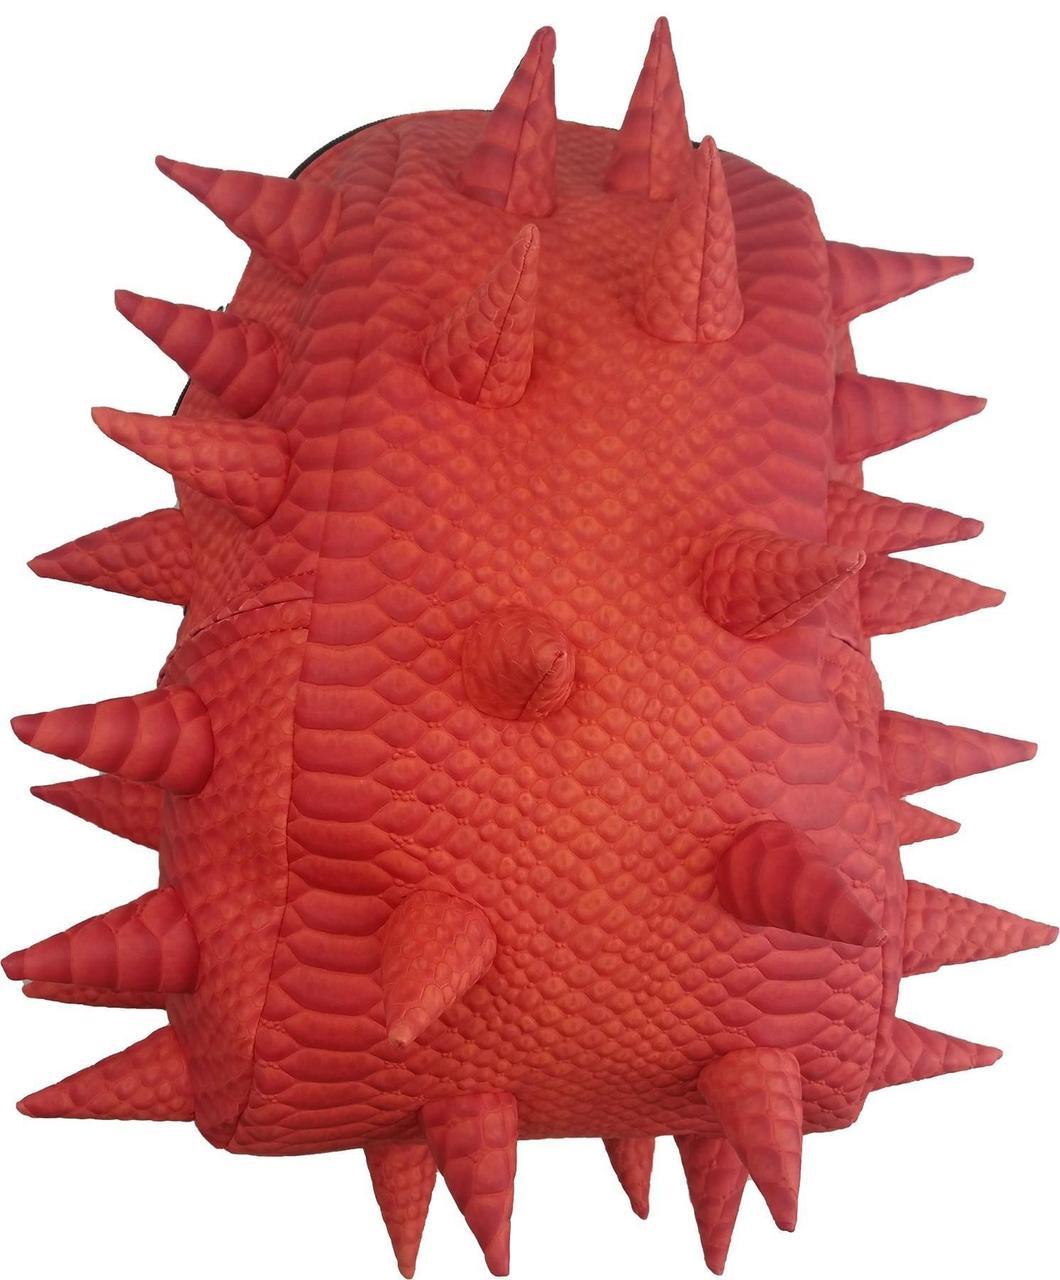 Рюкзак Madpax New skkins Full Red Coral (M/SKI/COR/FULL)